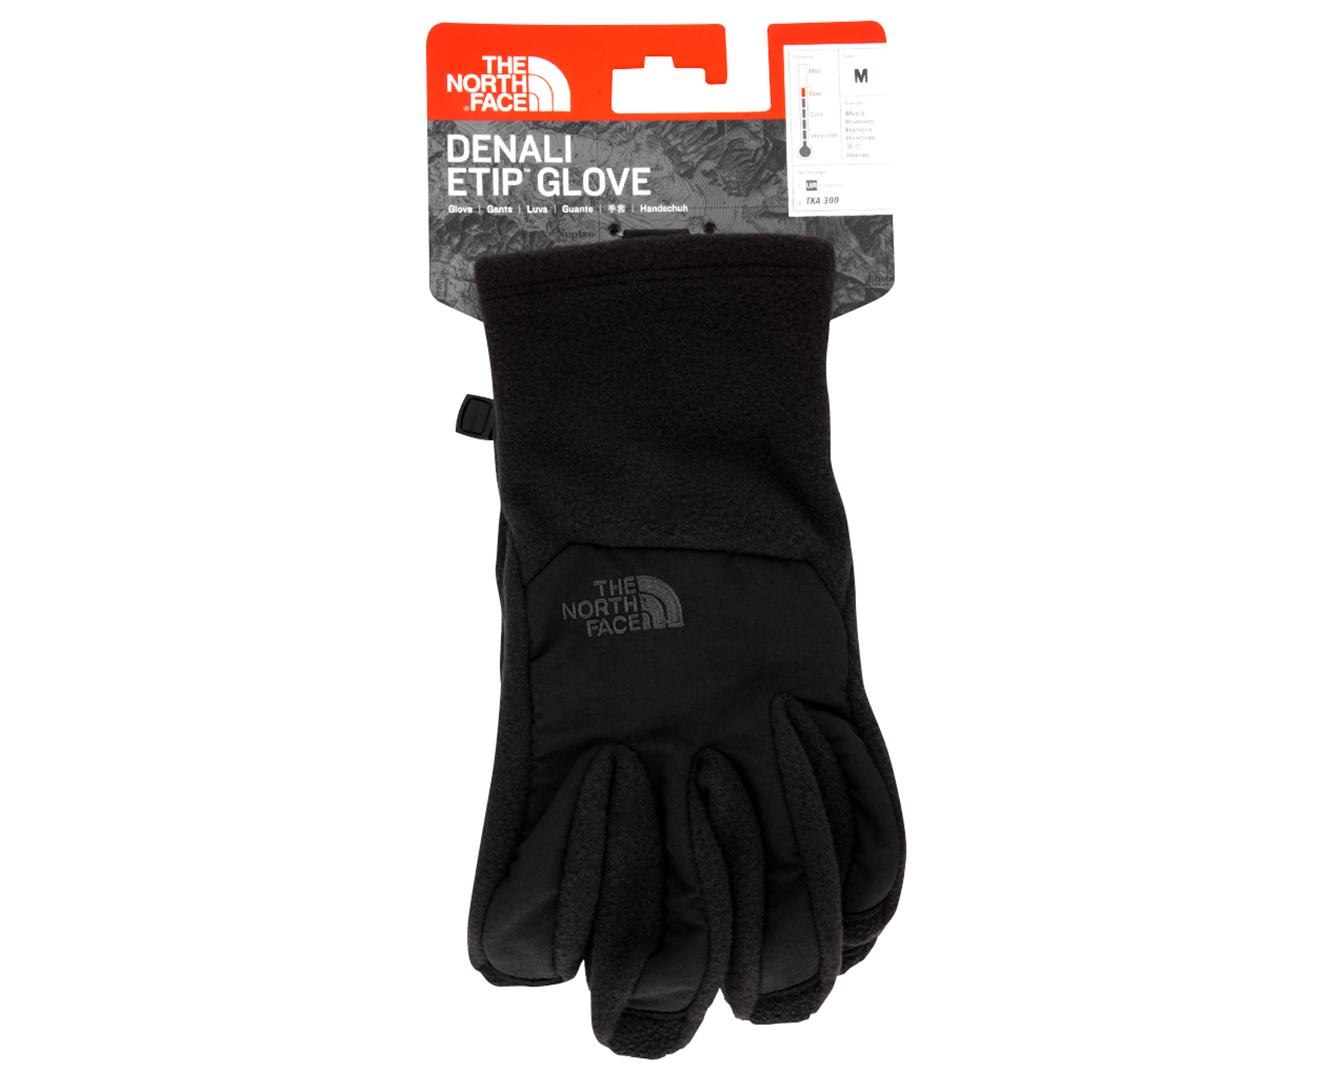 79bd201c0 The North Face Men's Denali Etip Glove - TNF Black